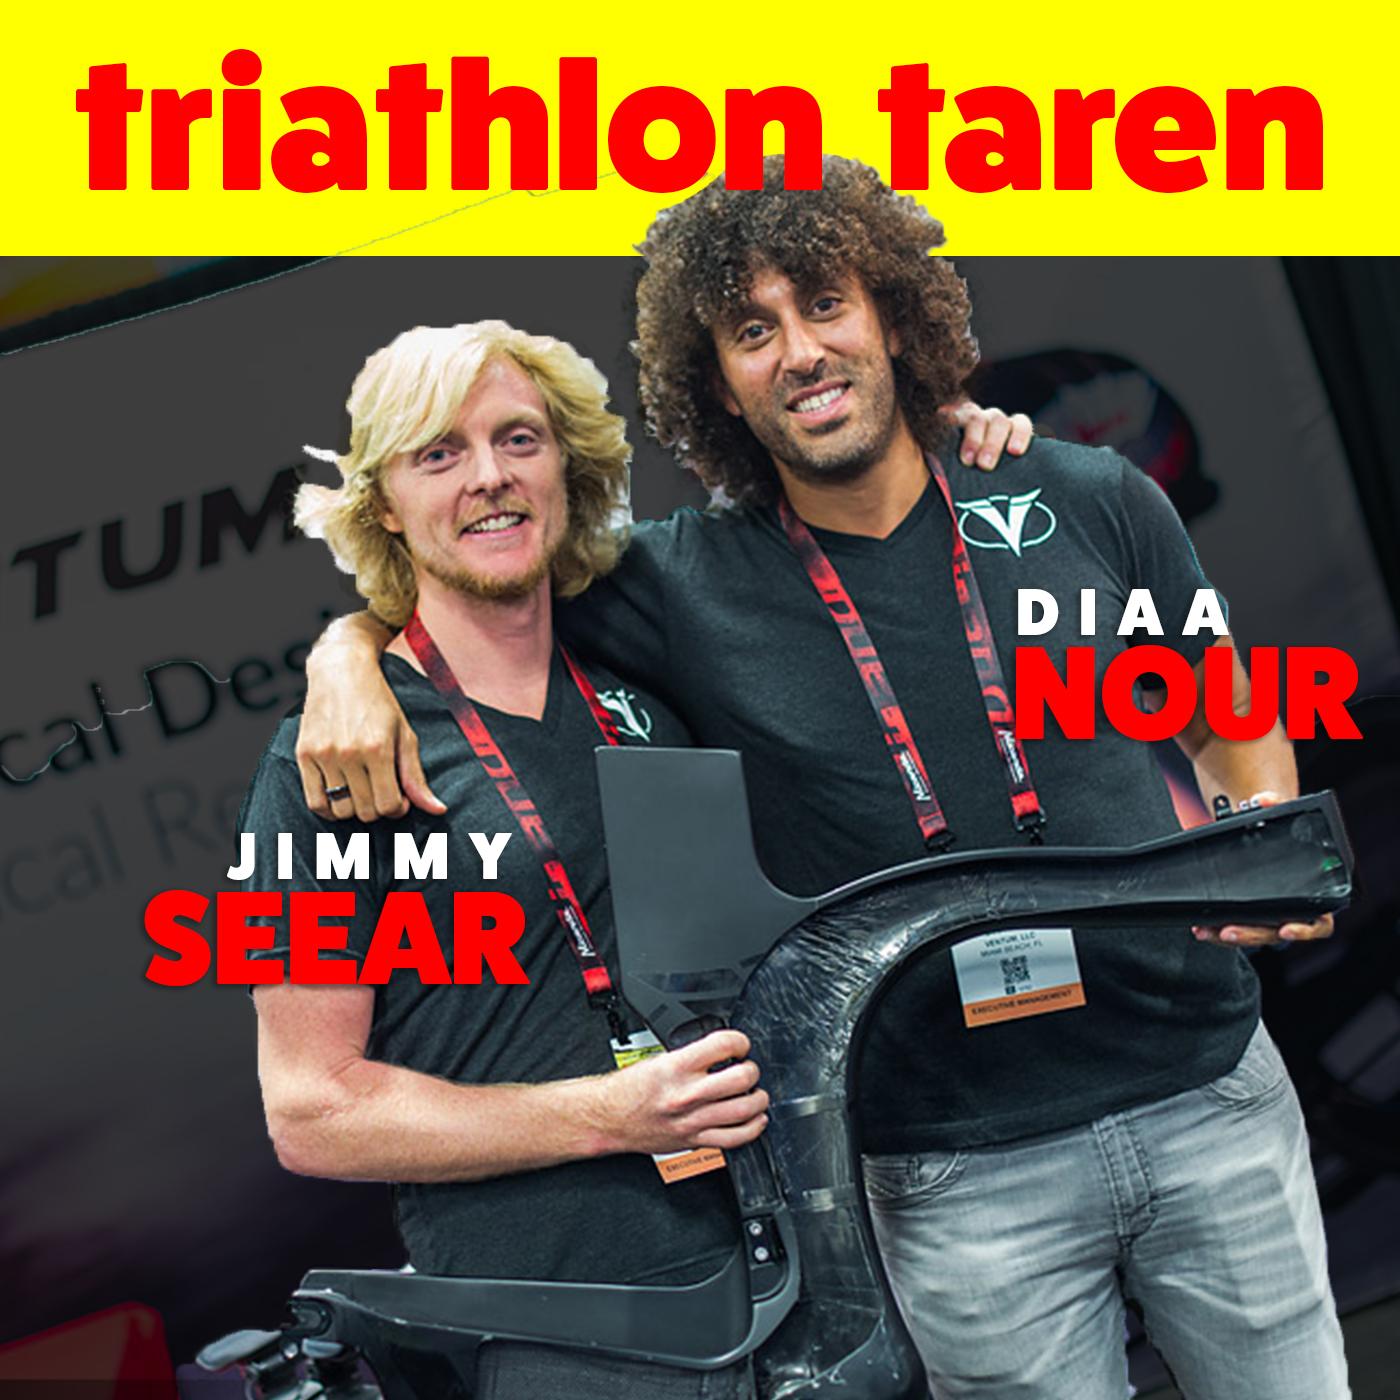 Ventum Bike Founders Jimmy Seear & Diaa Nour talk $32,000 bikes, Negative Reviews, Triathlon Startups